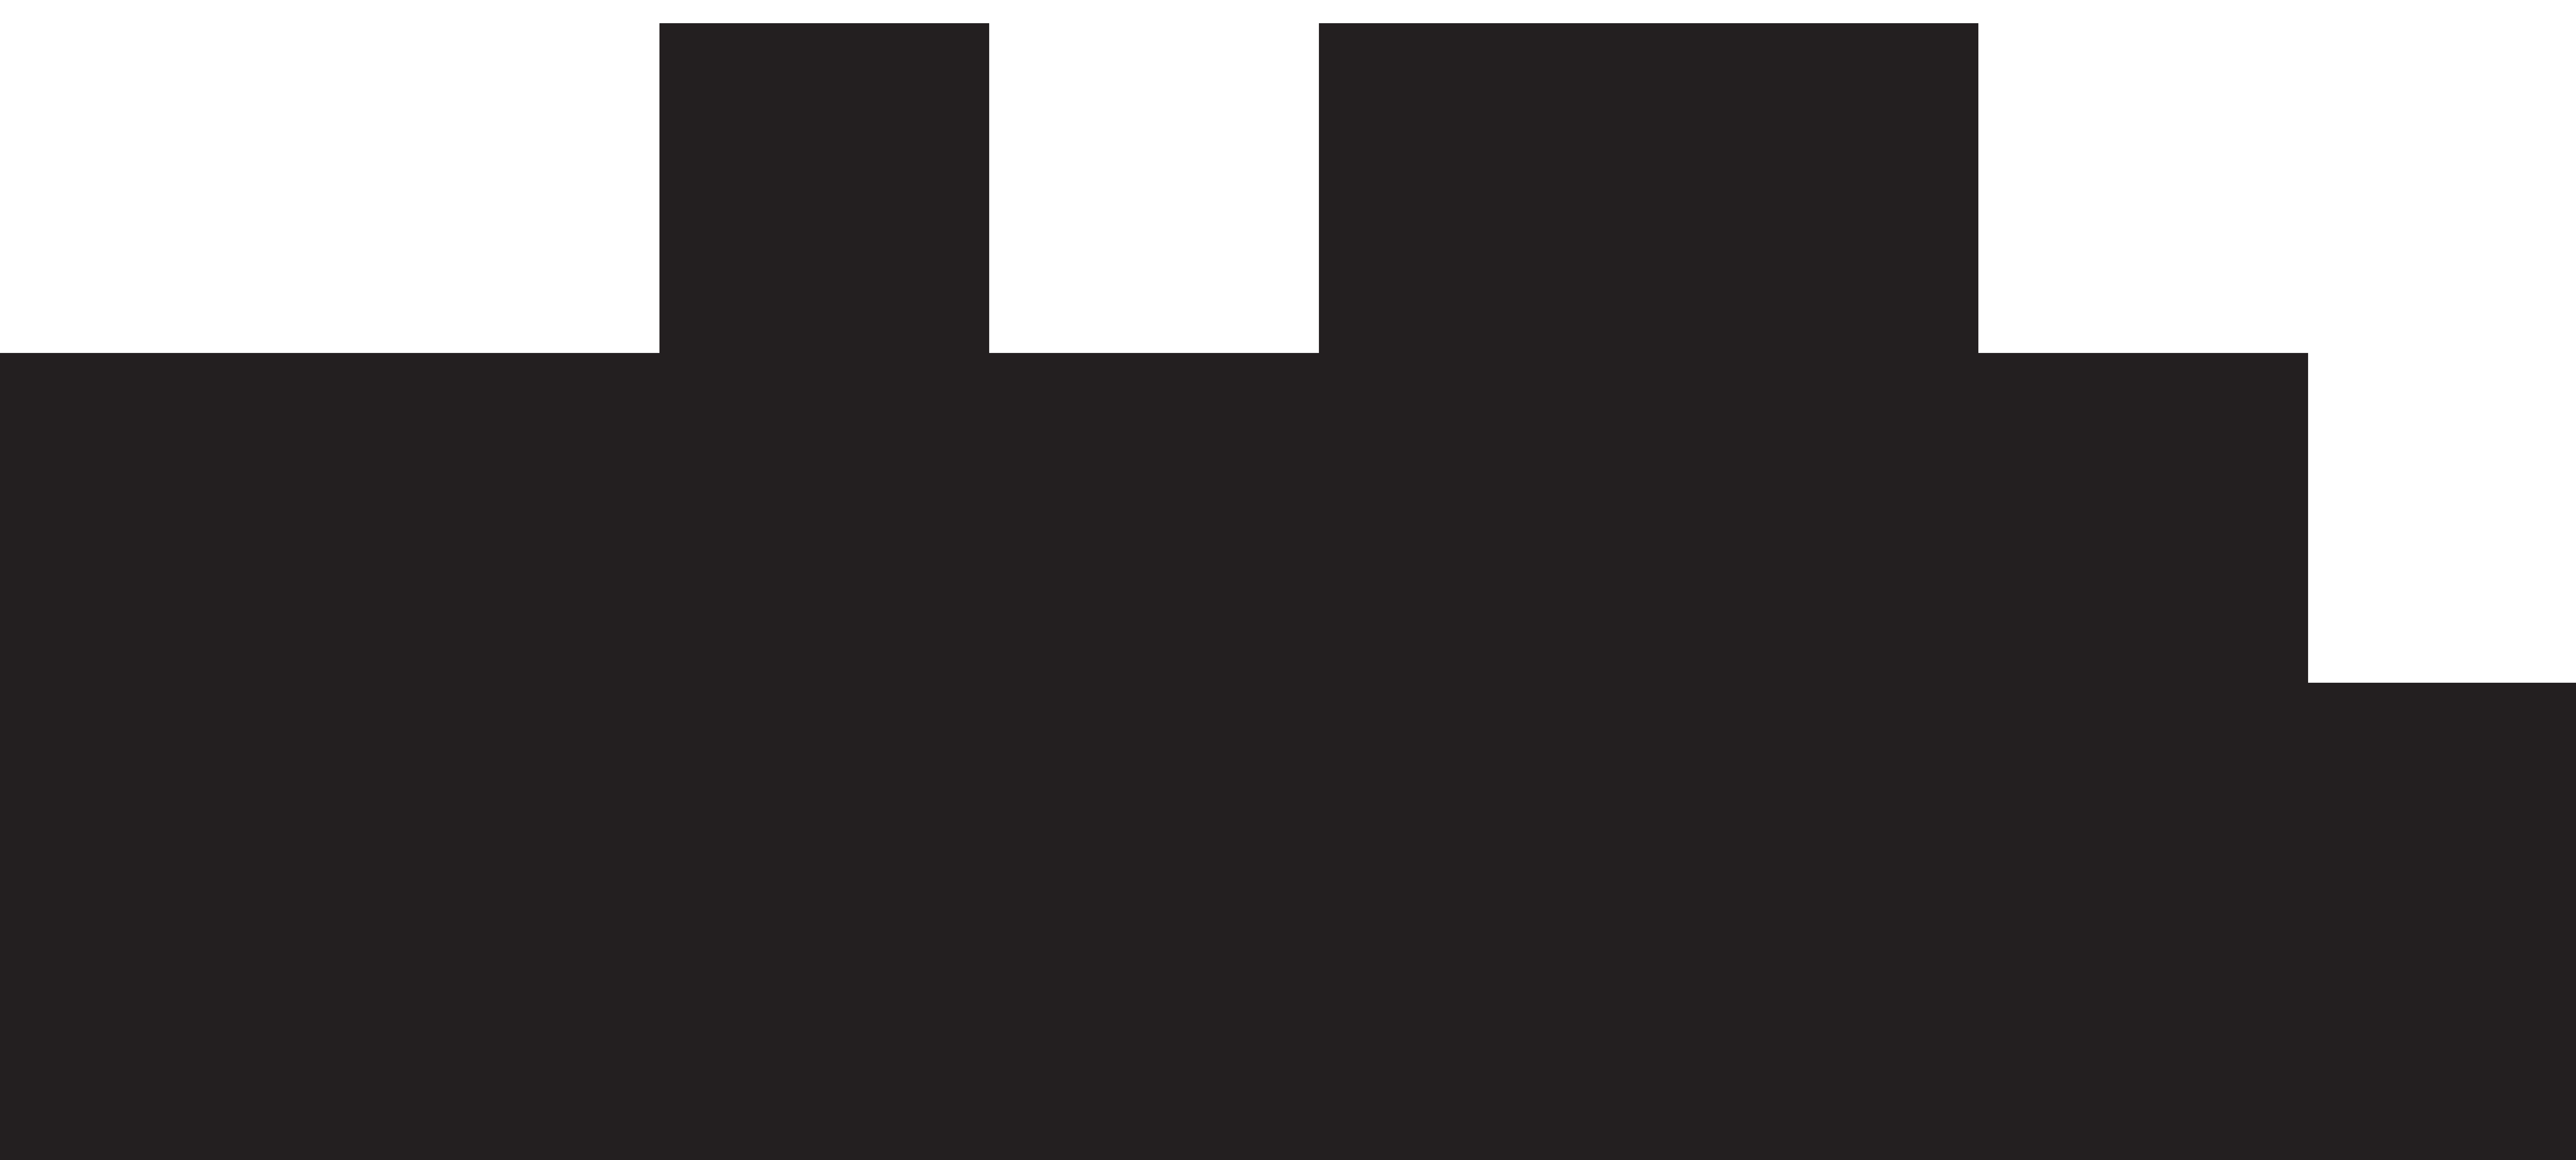 8000x3602 Skyline Clipart Transparent